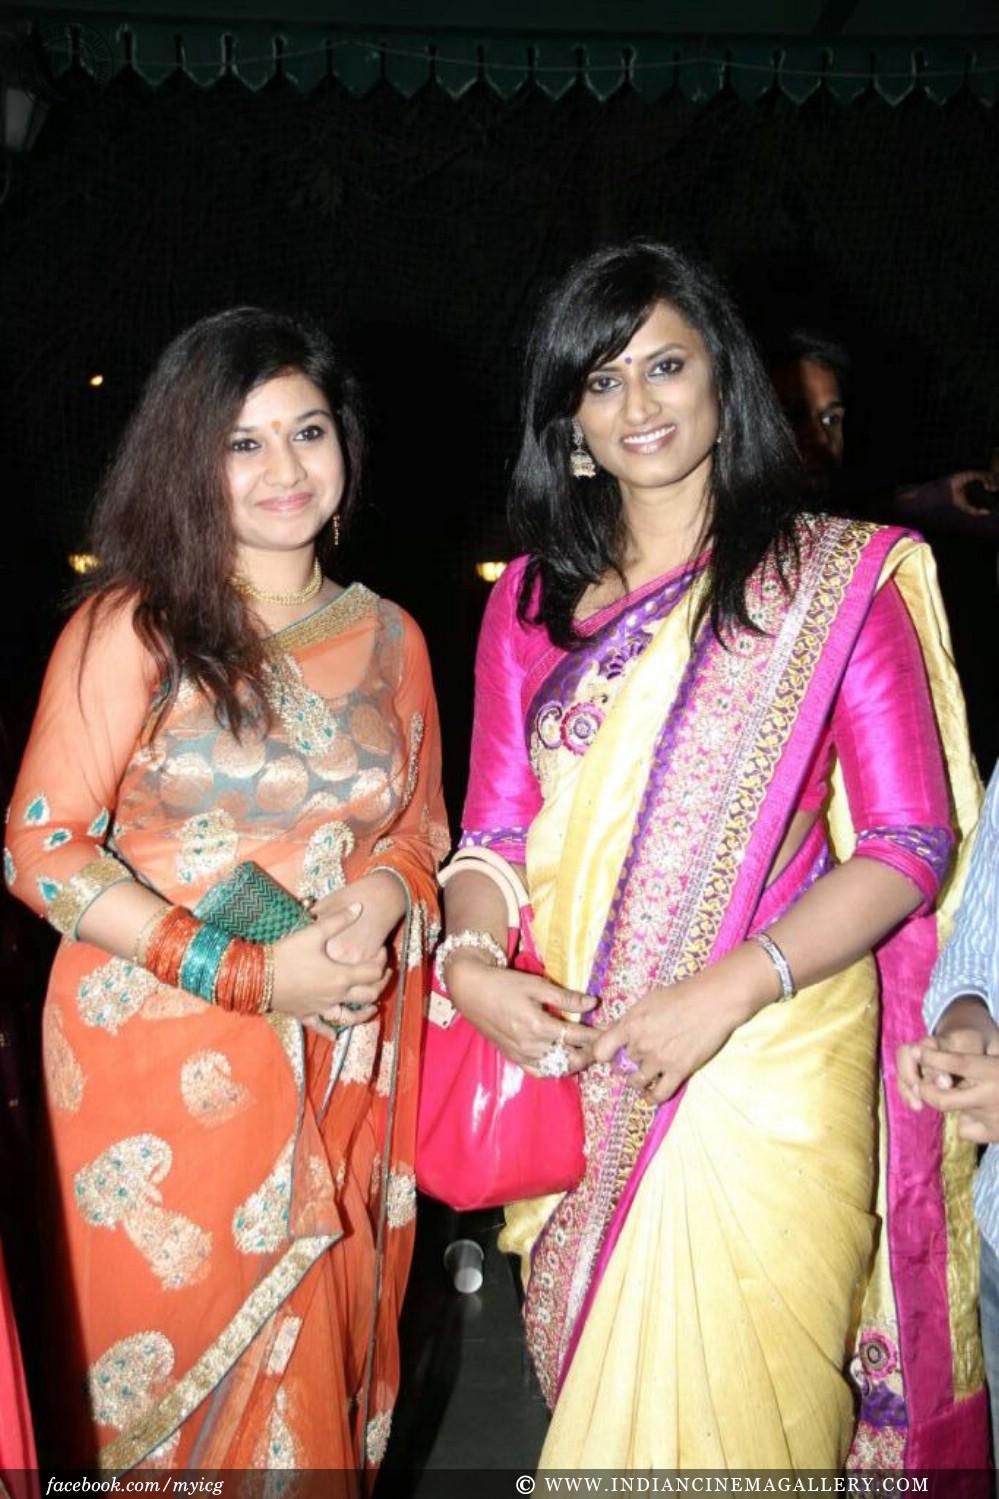 Deepu sharma indian couple sex in delhi hotel hubbycamscom - 5 3